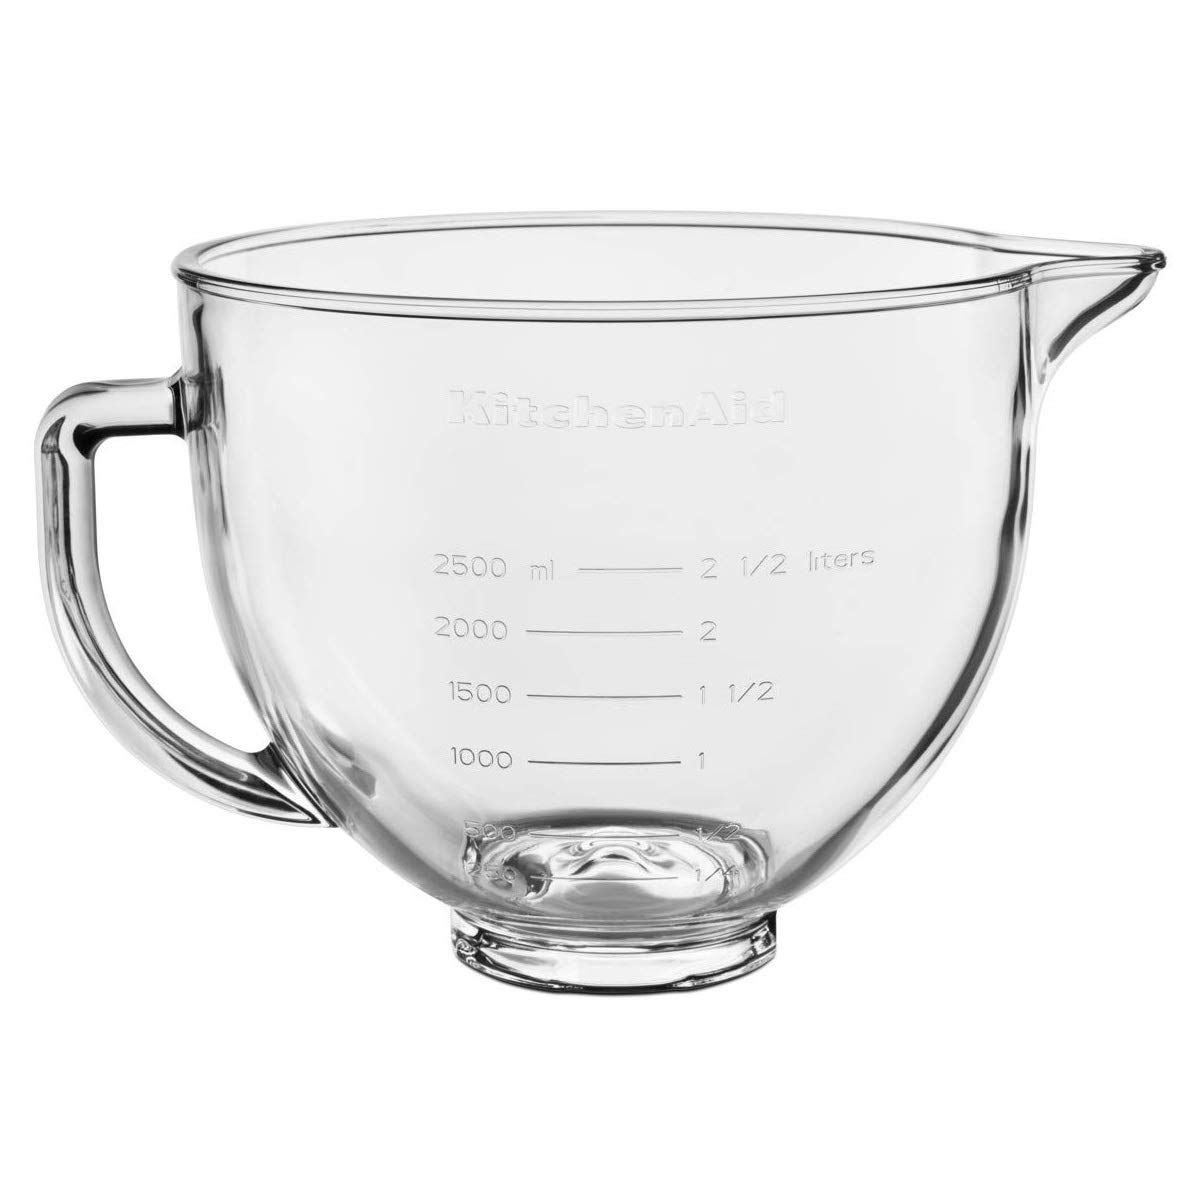 KitchenAid 5KSM5GB Stand Mixer Optional Accessory, Refreshed Glass, Trasparent